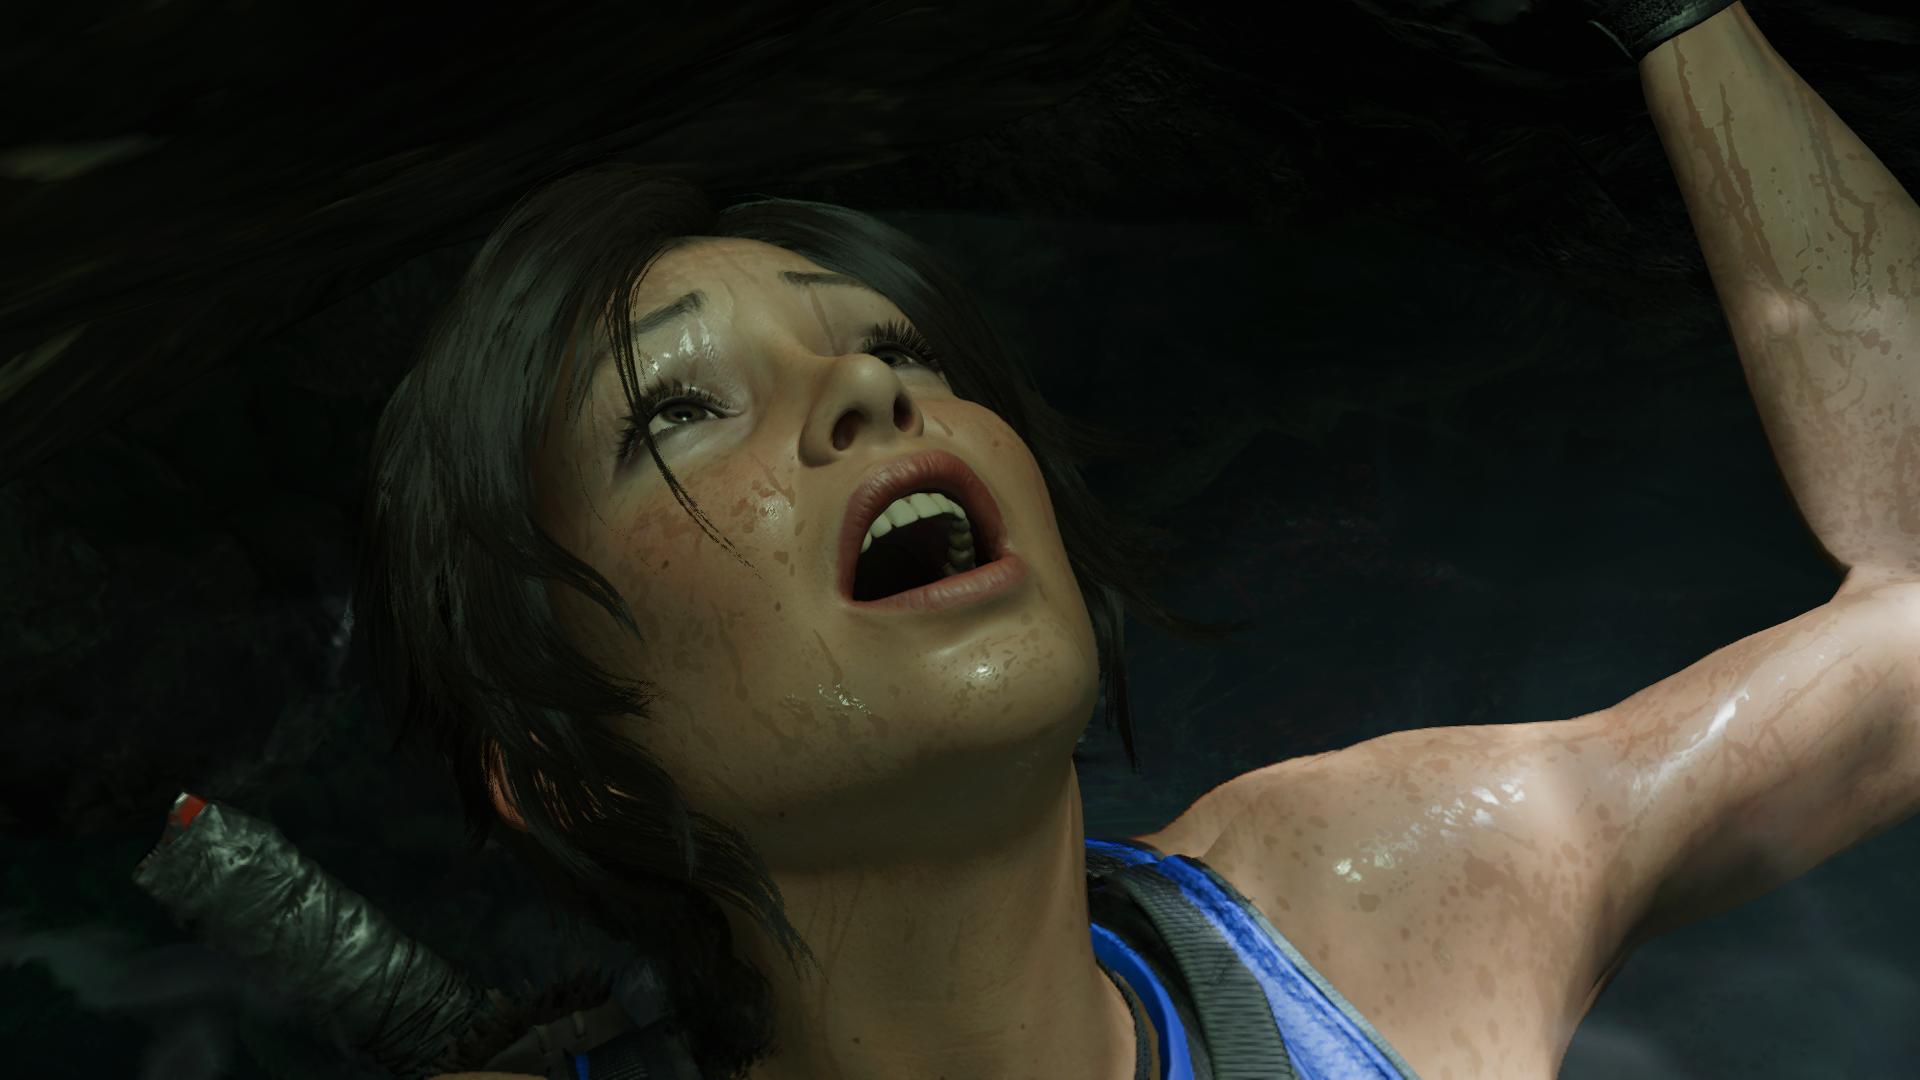 Desktop Screenshot 2018.11.18 - 19.48.58.77.png - Shadow of the Tomb Raider